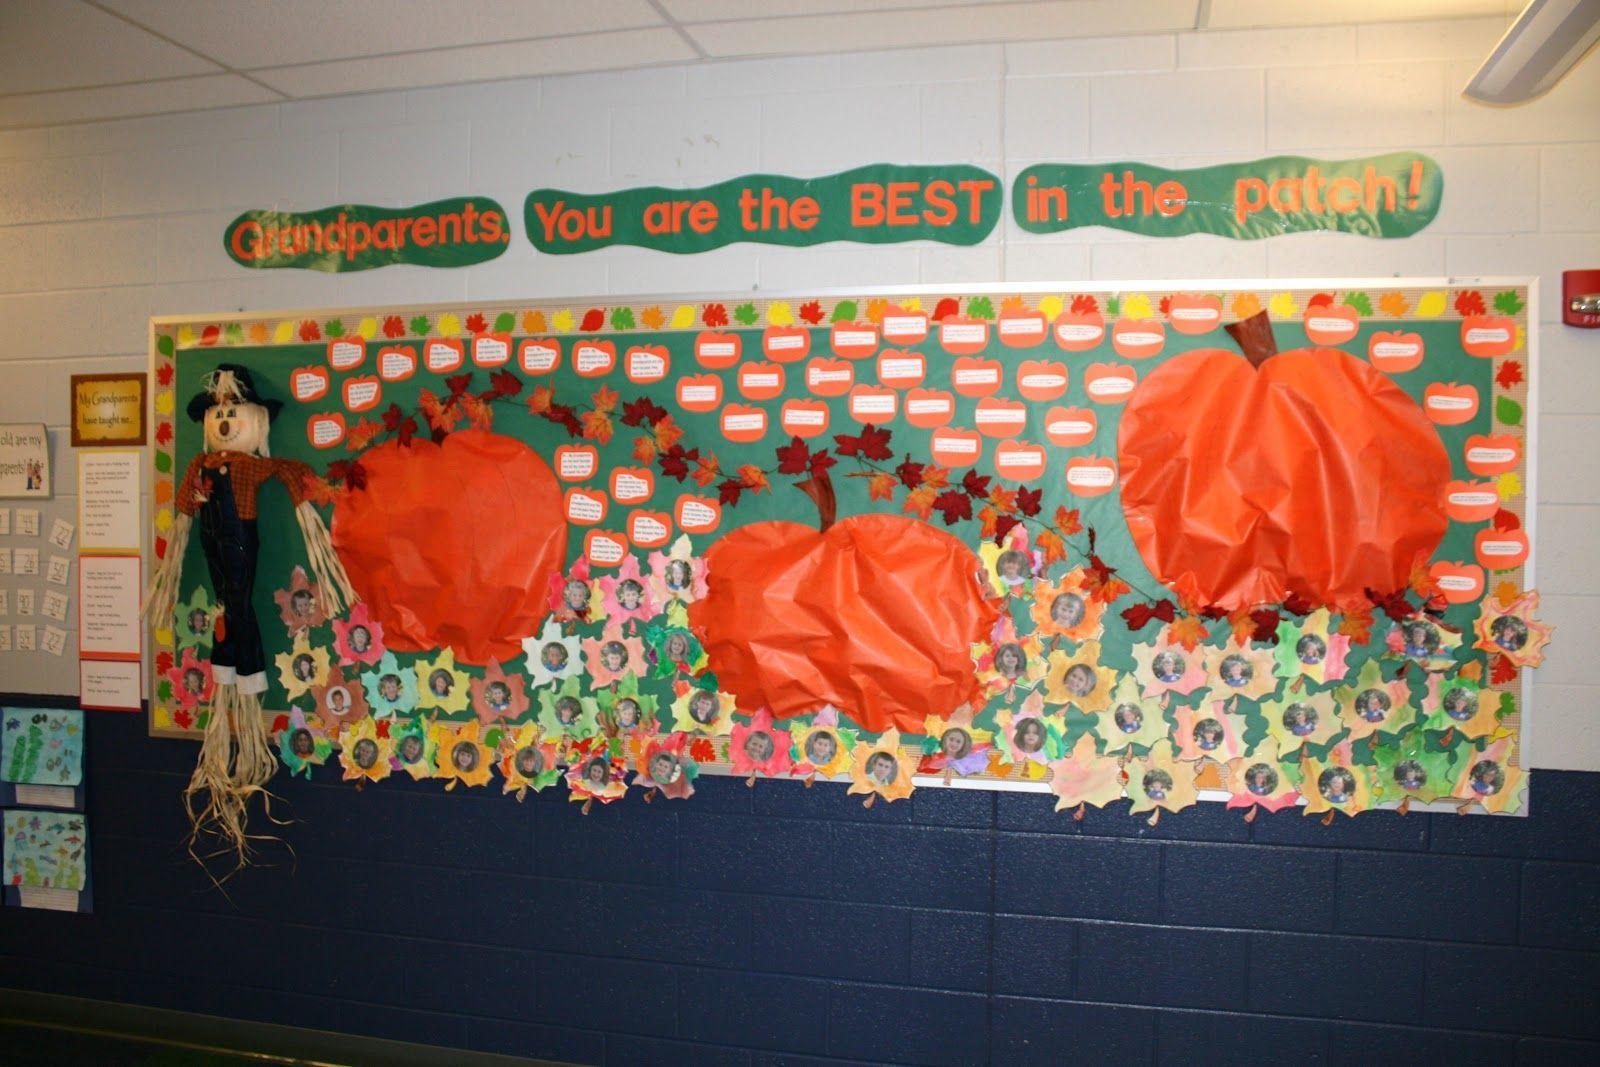 First Day Bulletin Boards | Mrs. Butterfield's First Grade: Pumpkin Patch Bulletin Board #pumpkinpatchbulletinboard First Day Bulletin Boards | Mrs. Butterfield's First Grade: Pumpkin Patch Bulletin Board #pumpkinpatchbulletinboard